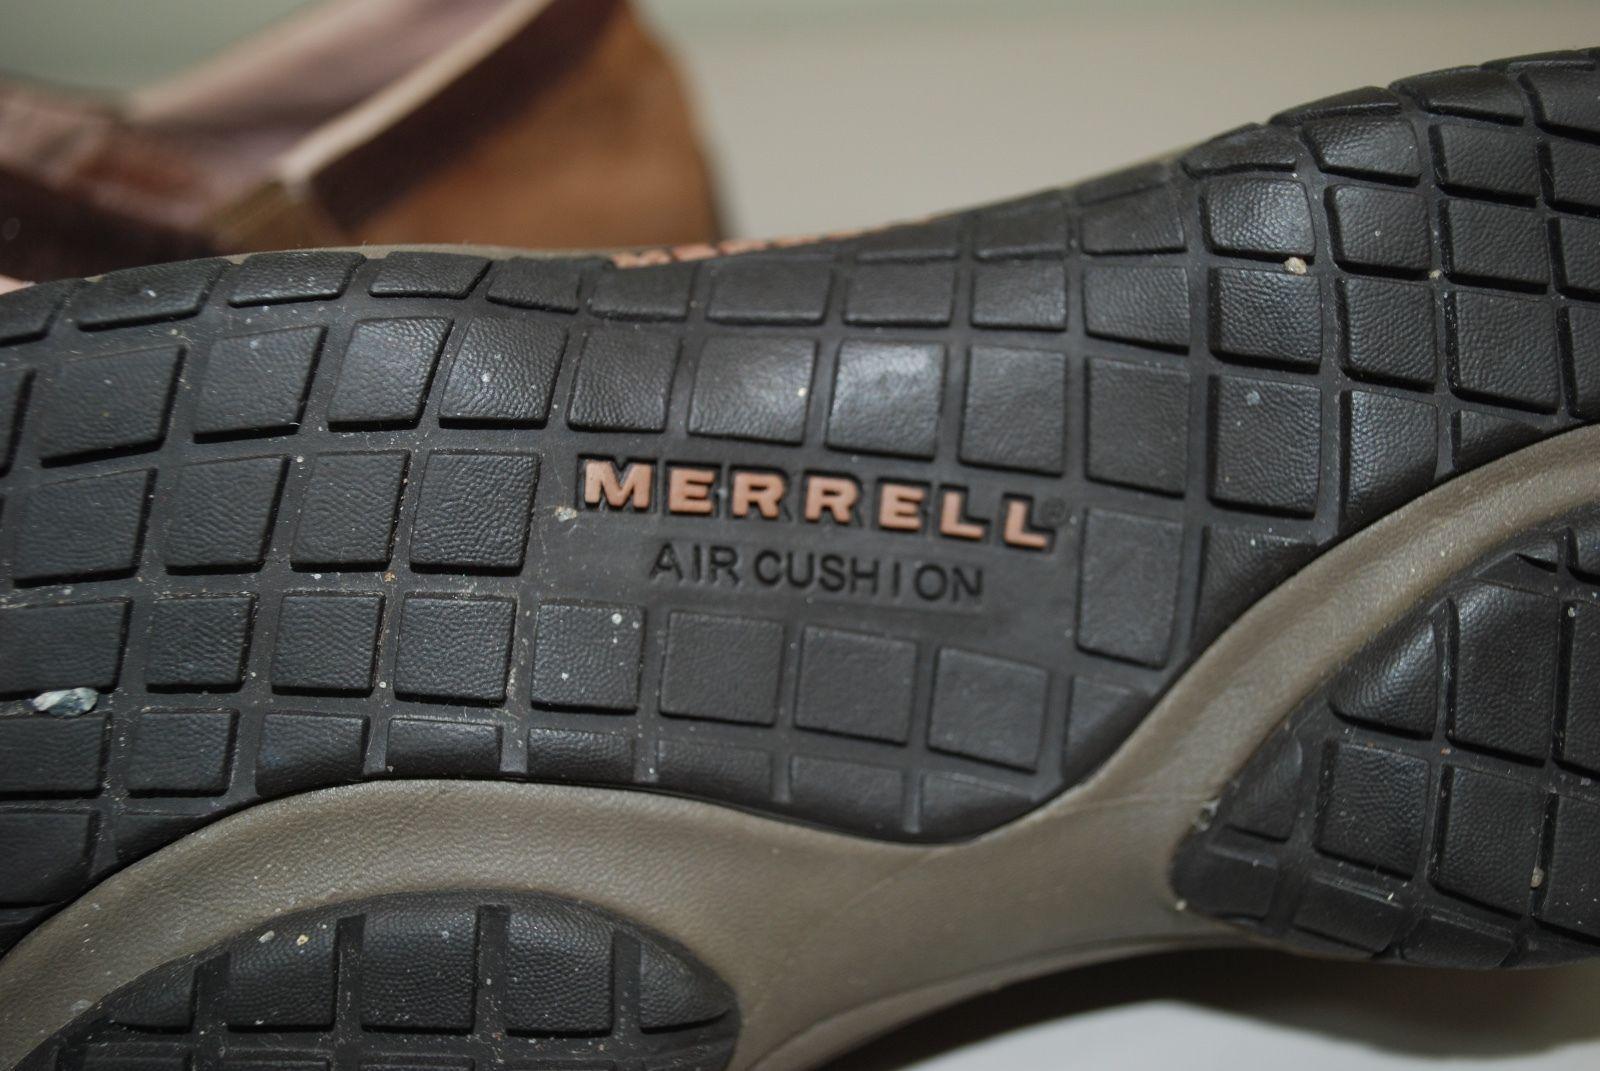 Merrell Encore Adams Brown Suede Leather Slip On Clogs/Mule Women's 7.5 Shoes